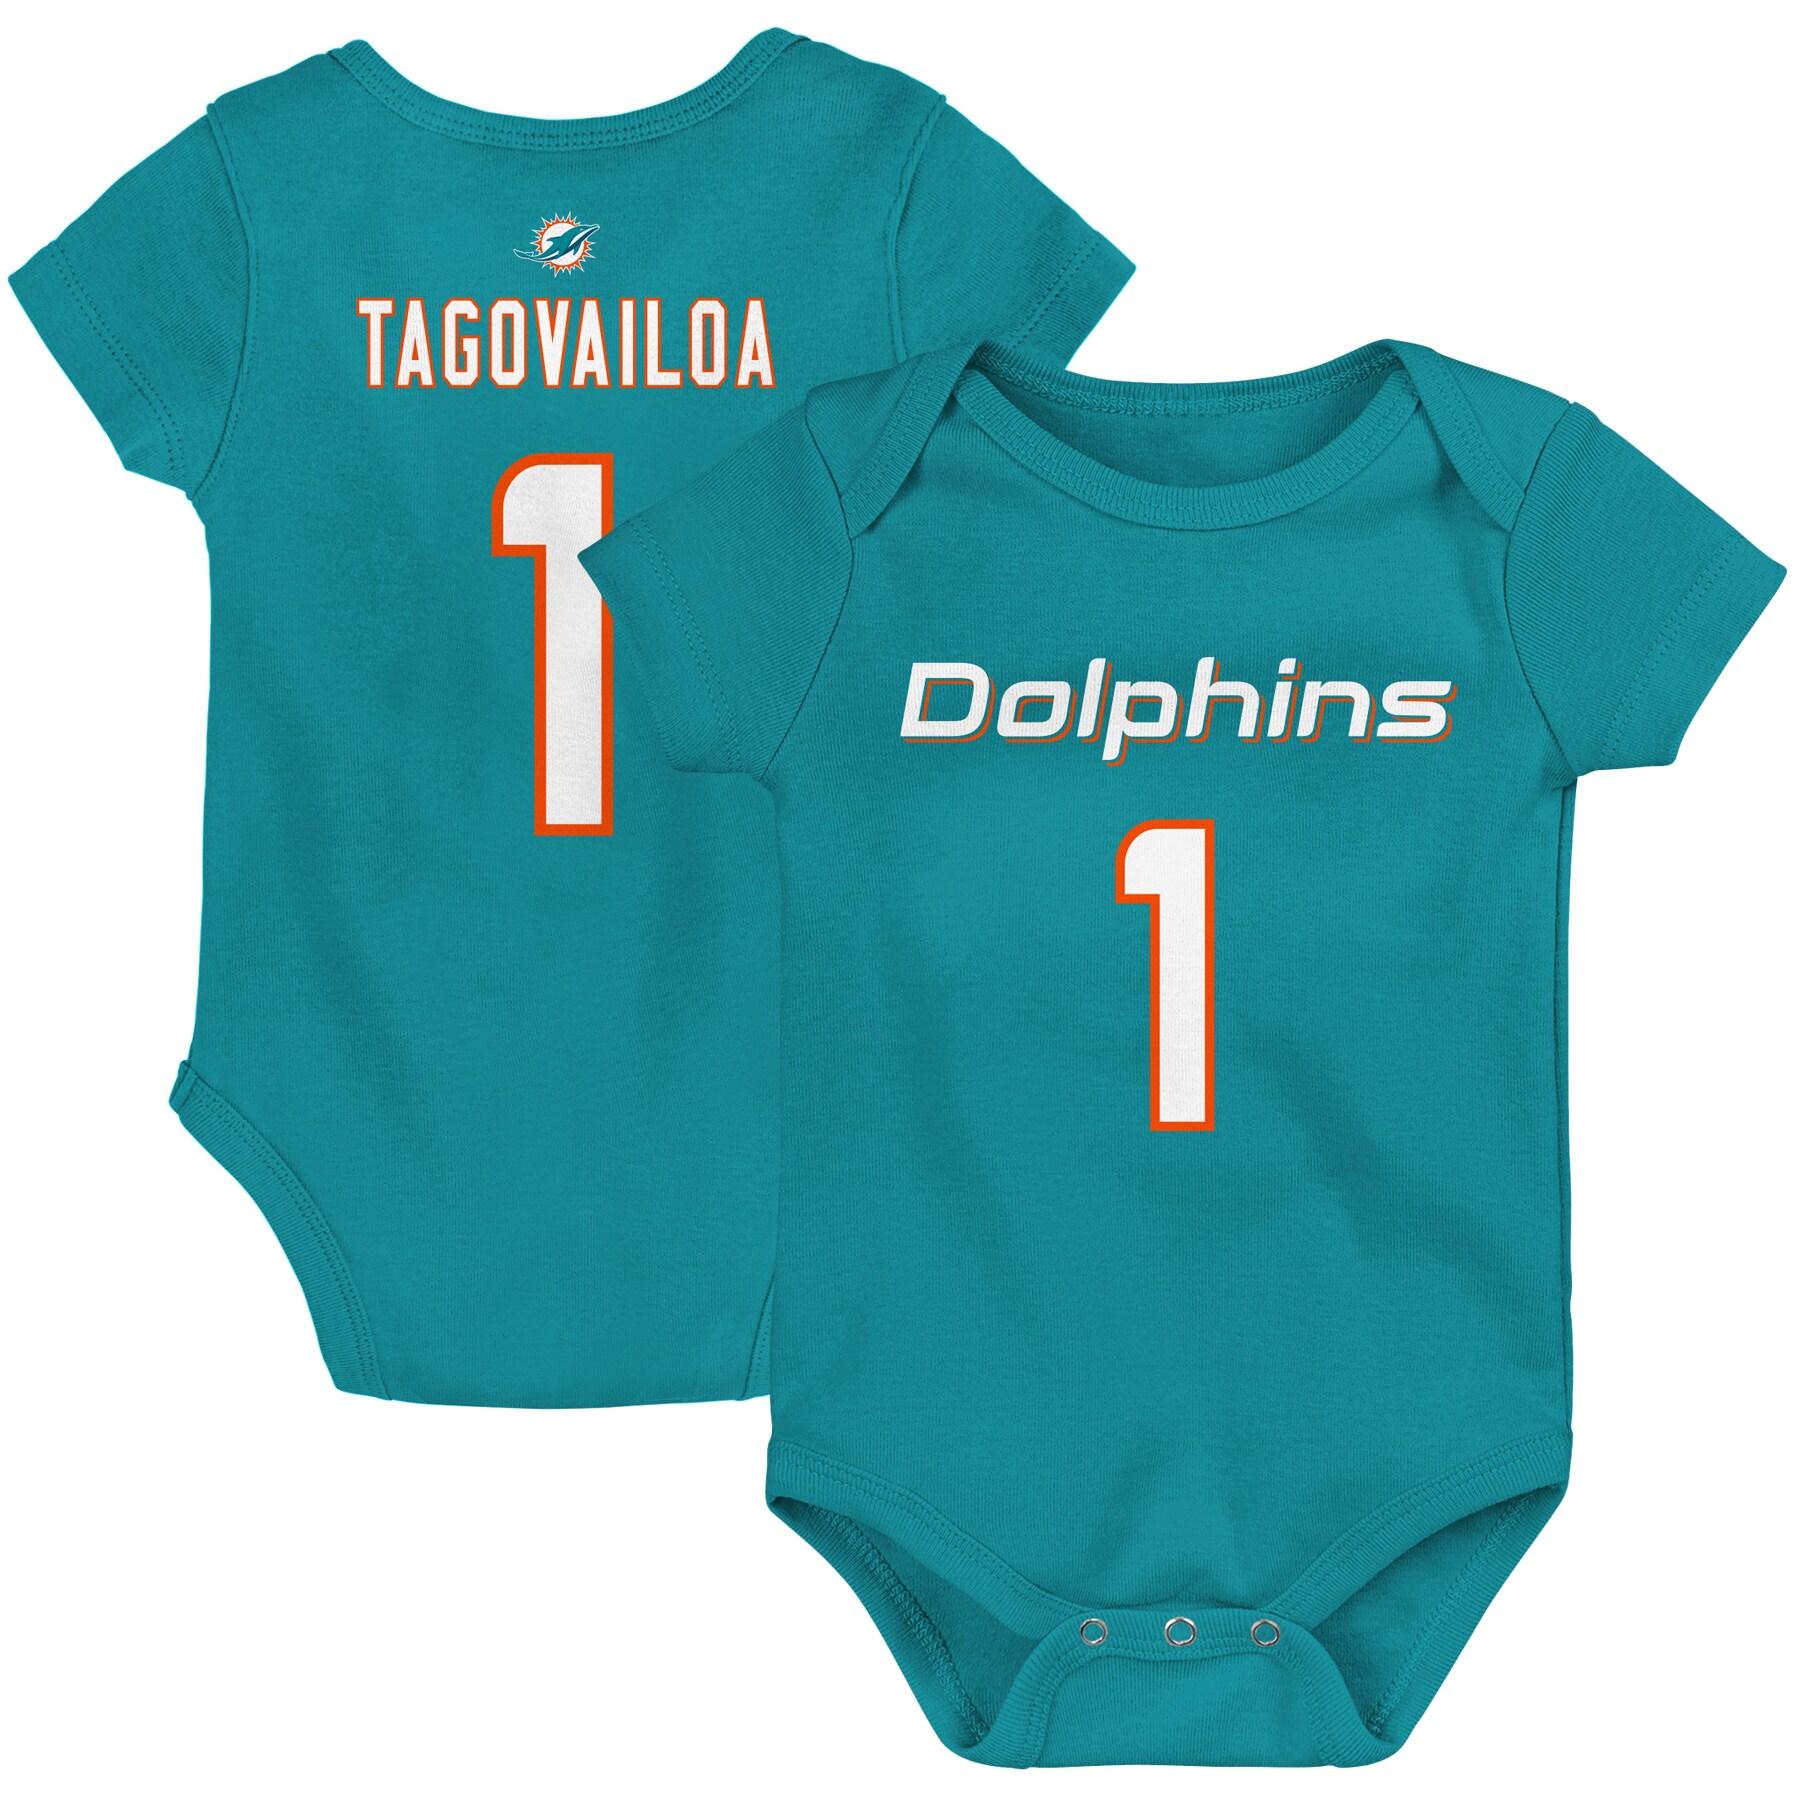 Tua Tagovailoa Miami Dolphins Newborn Mainliner Player Name & Number Bodysuit - Aqua